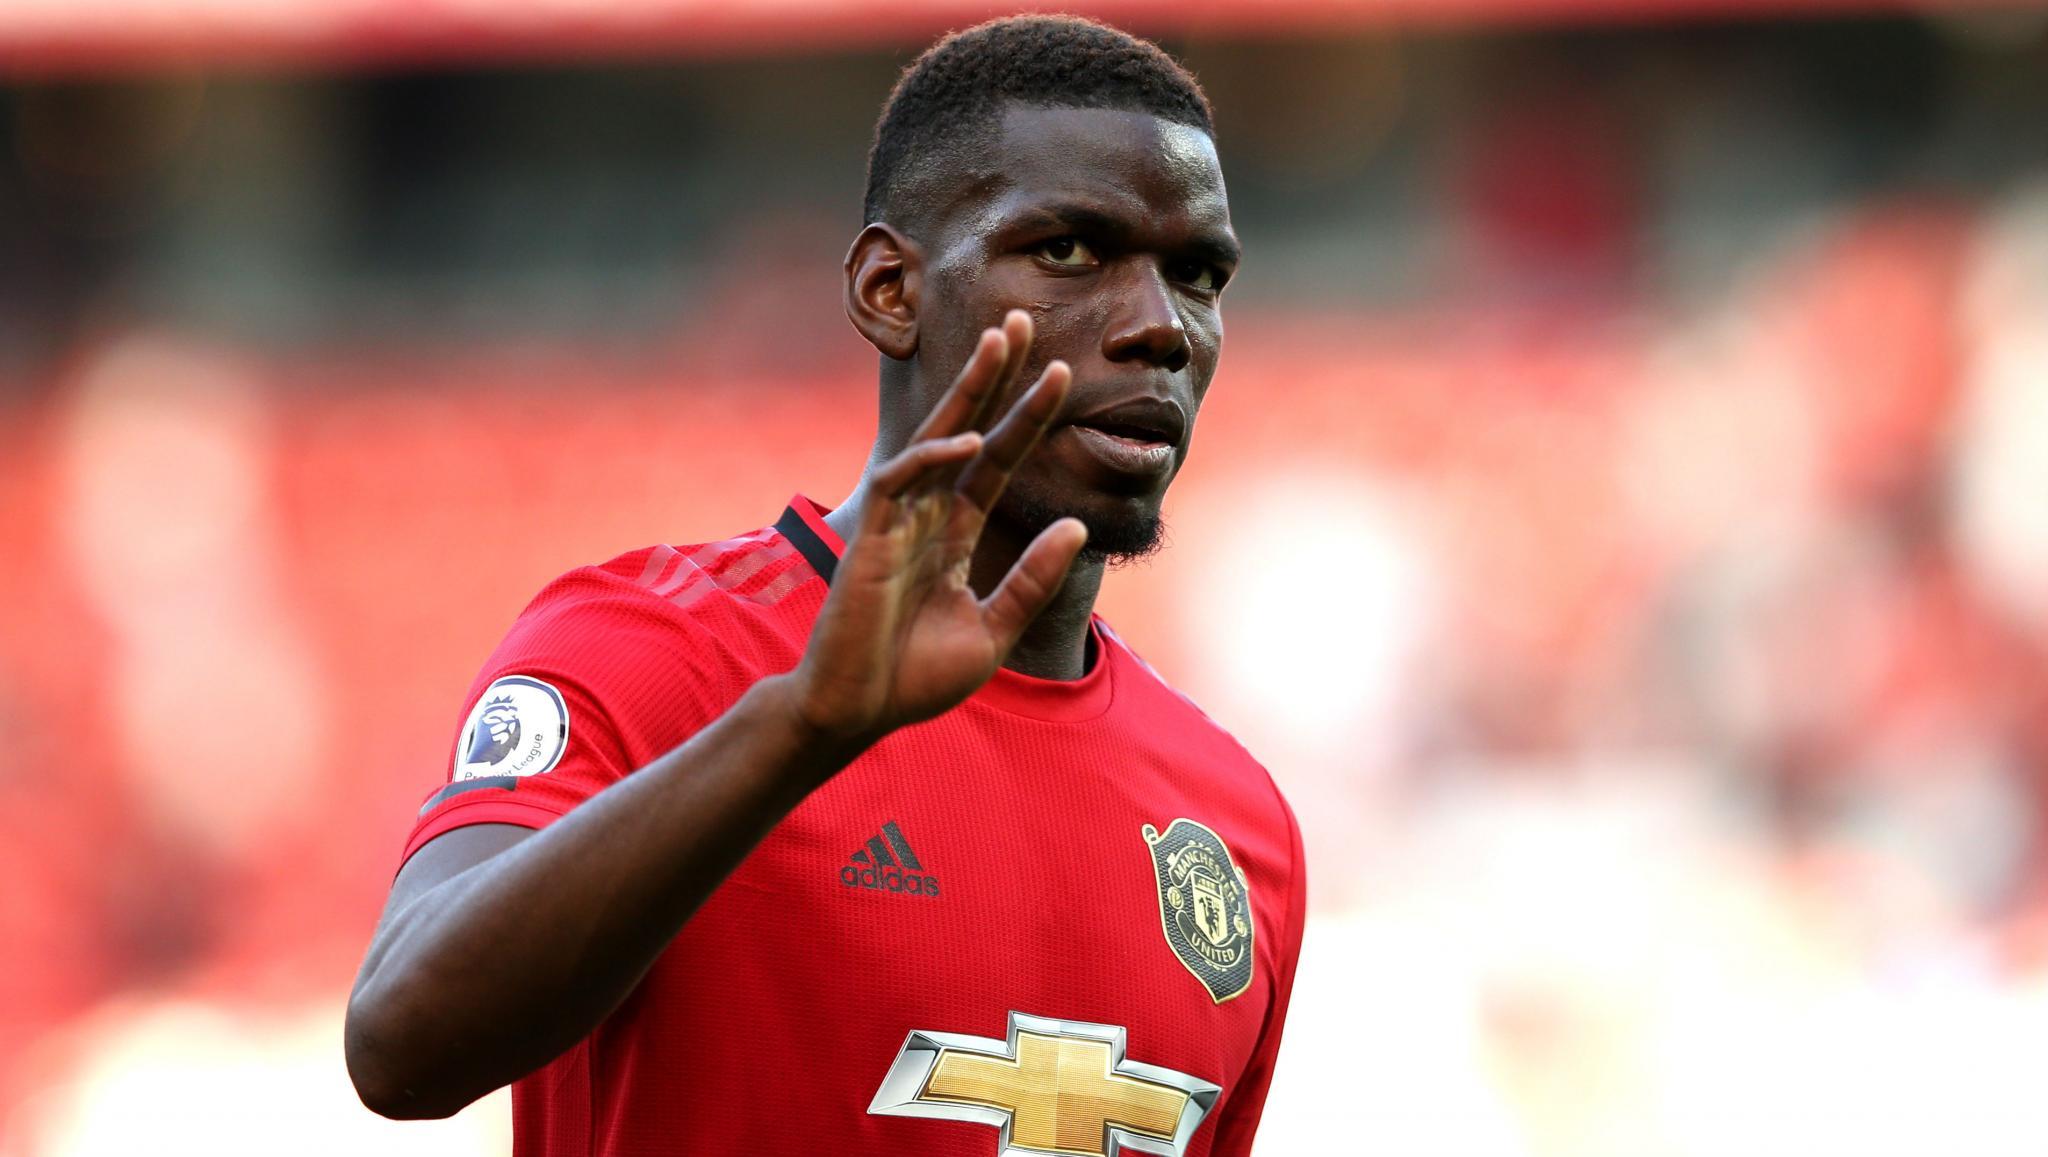 Paul Pogba, Manchester United Midfielder Mistakes Urine for Apple Juice in Social Media Video